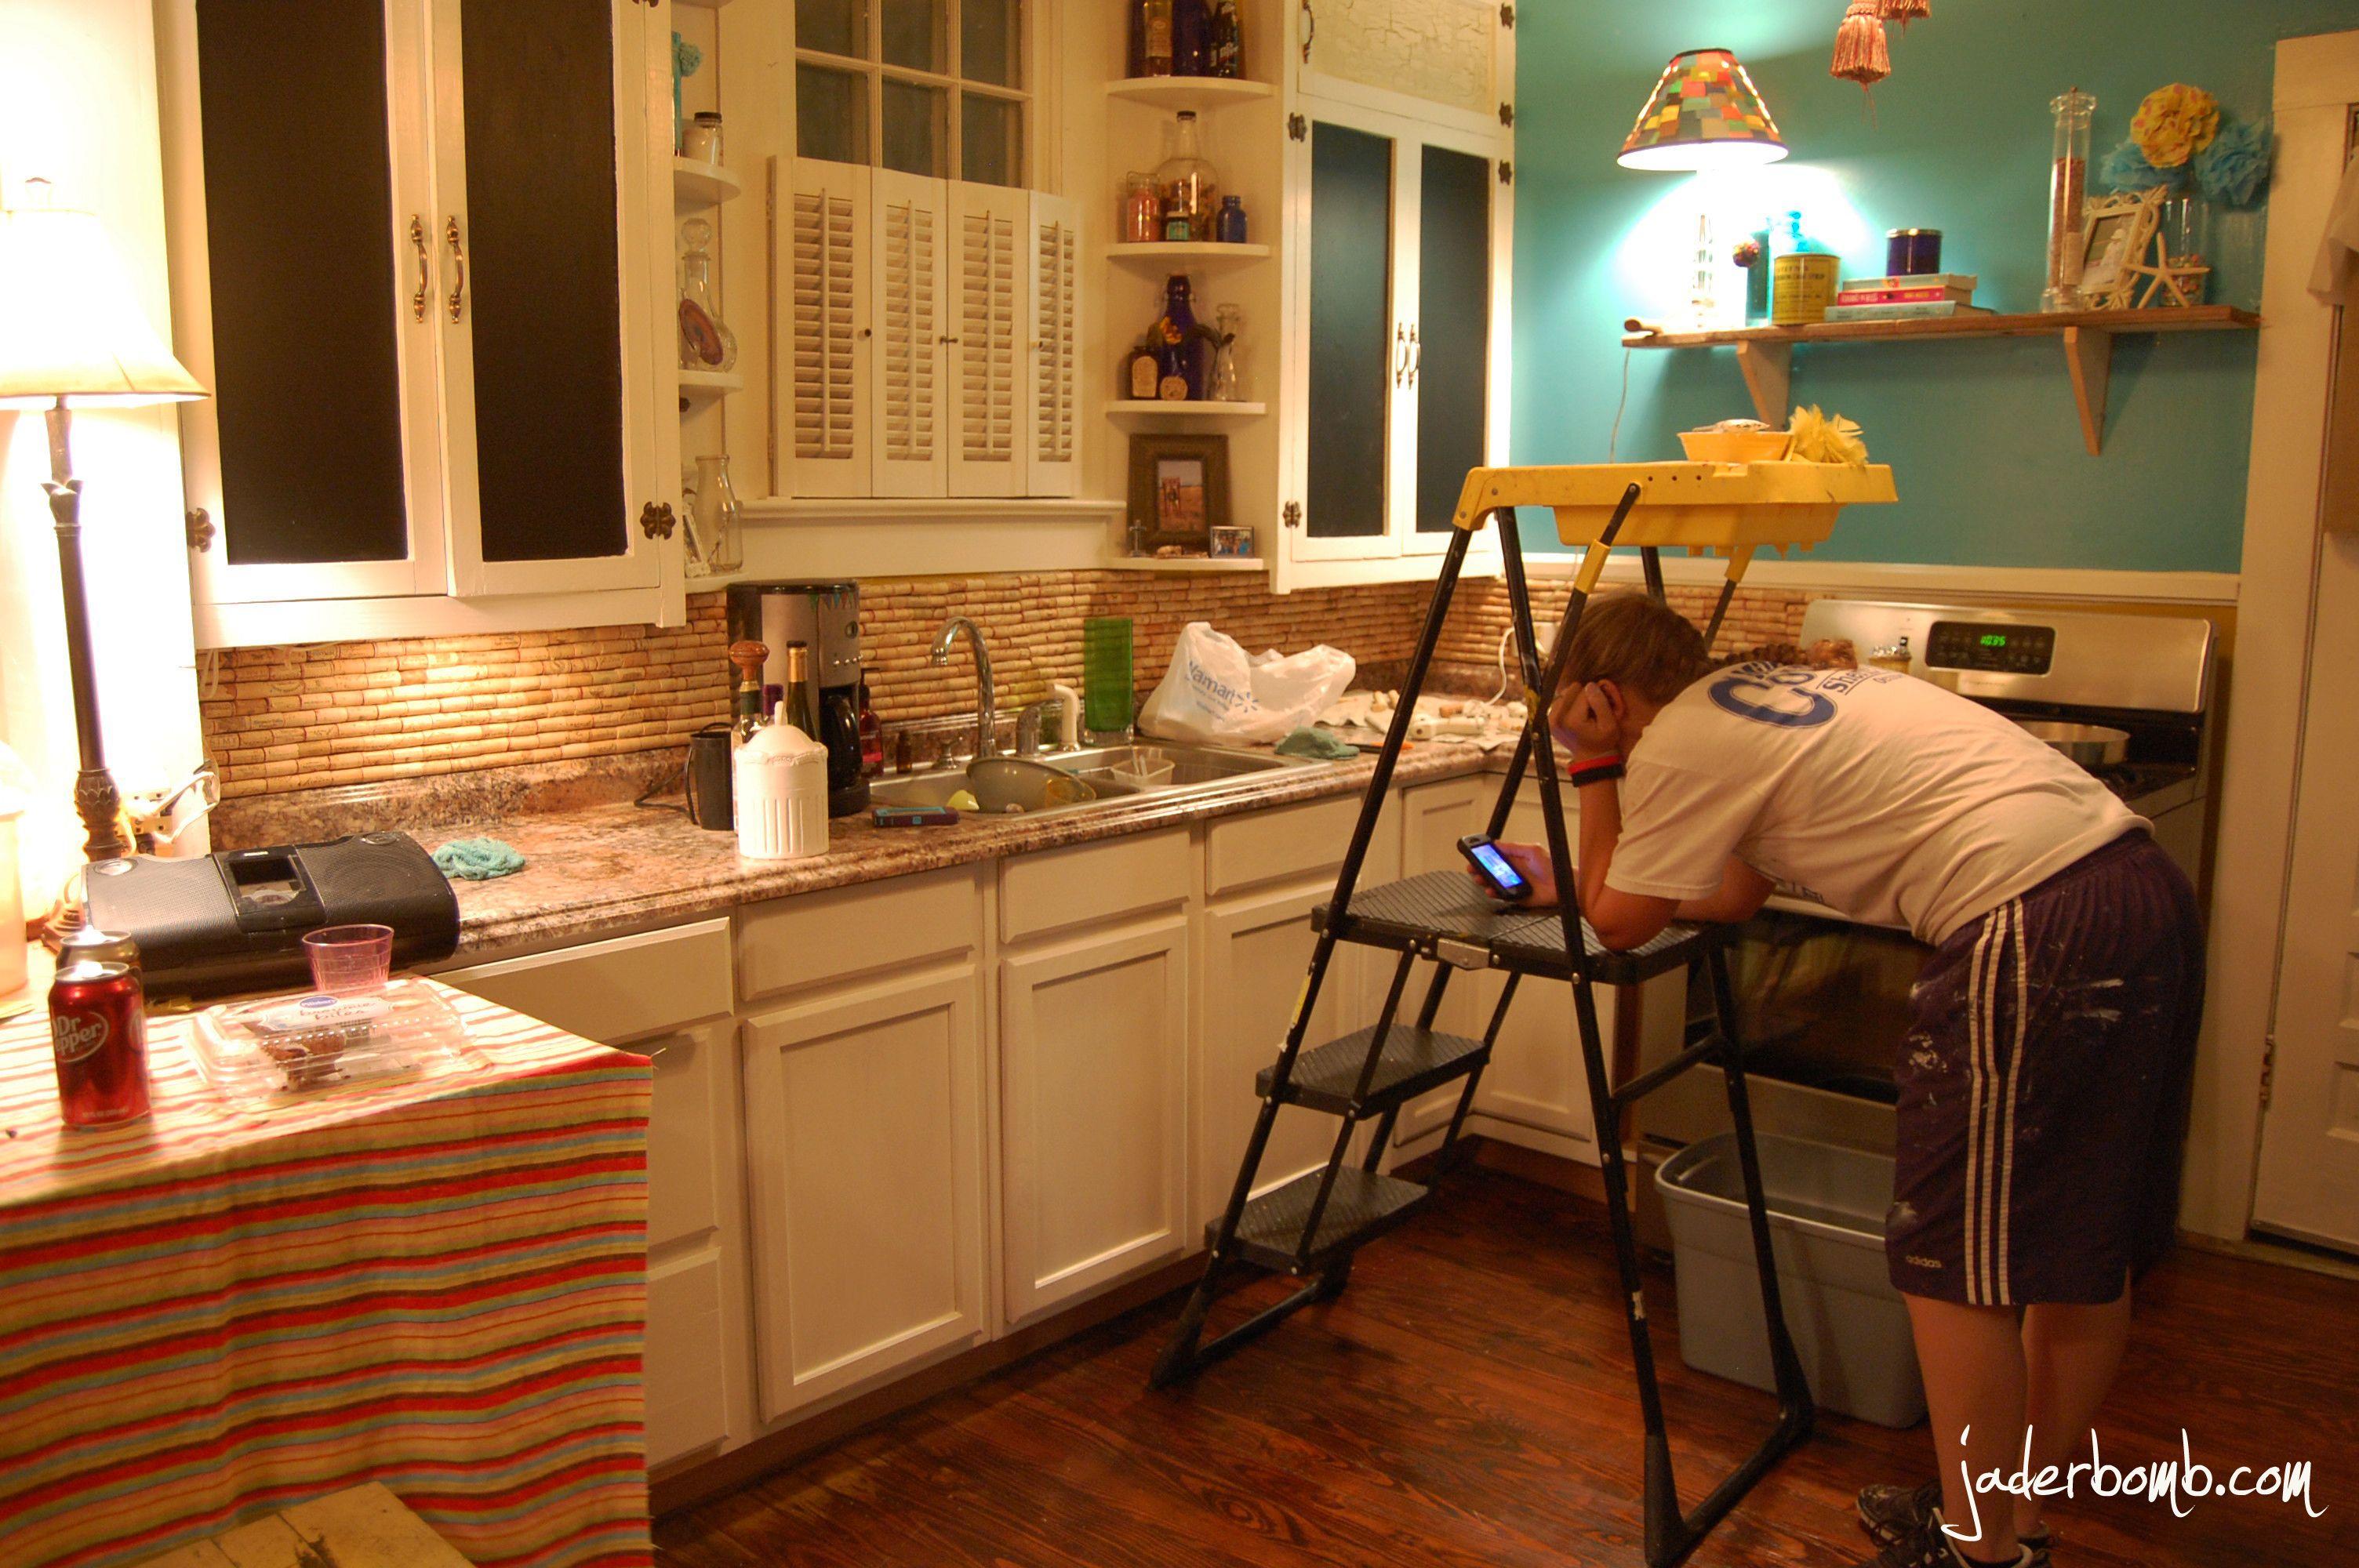 This customdesigned kitchen desk area features plenty of